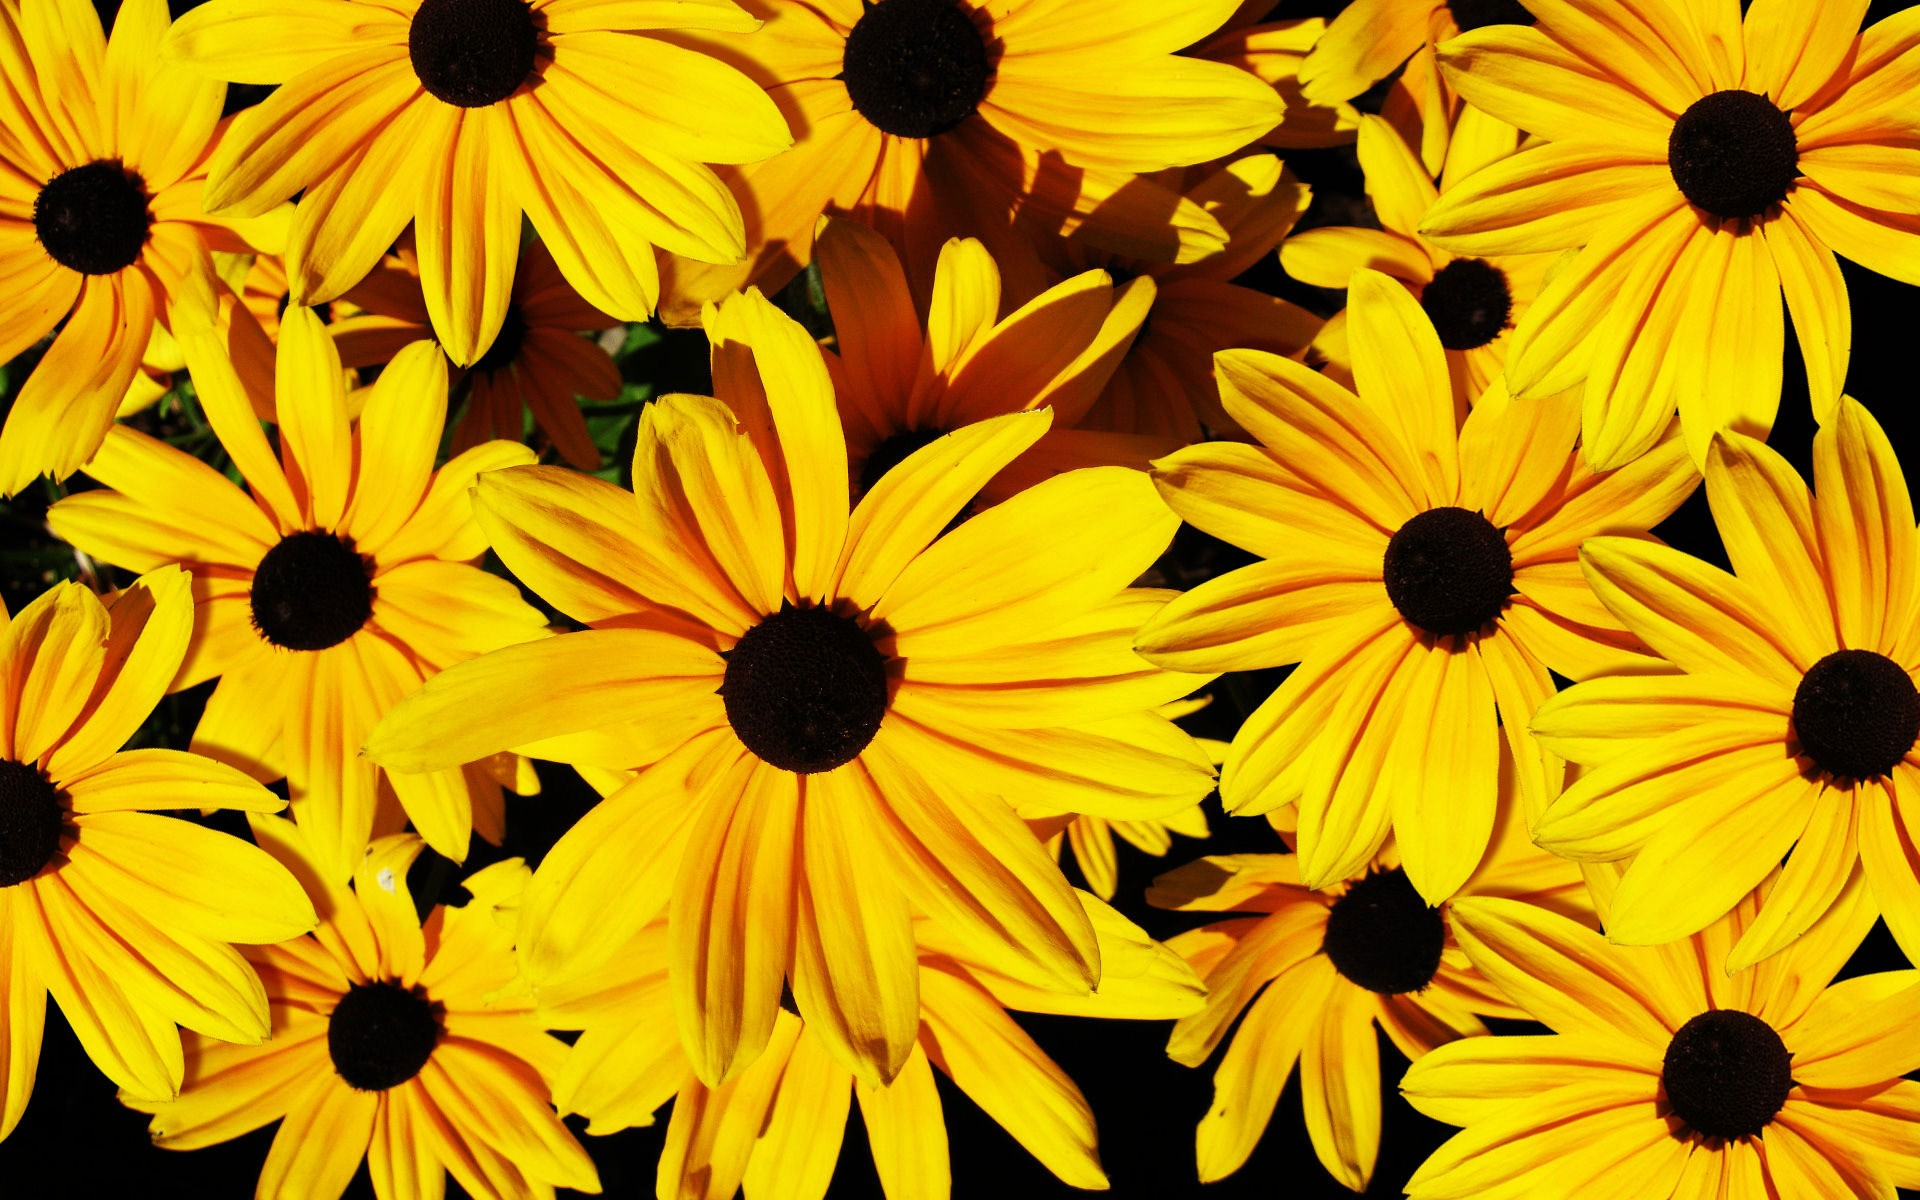 flower wallpaper stunning yellow